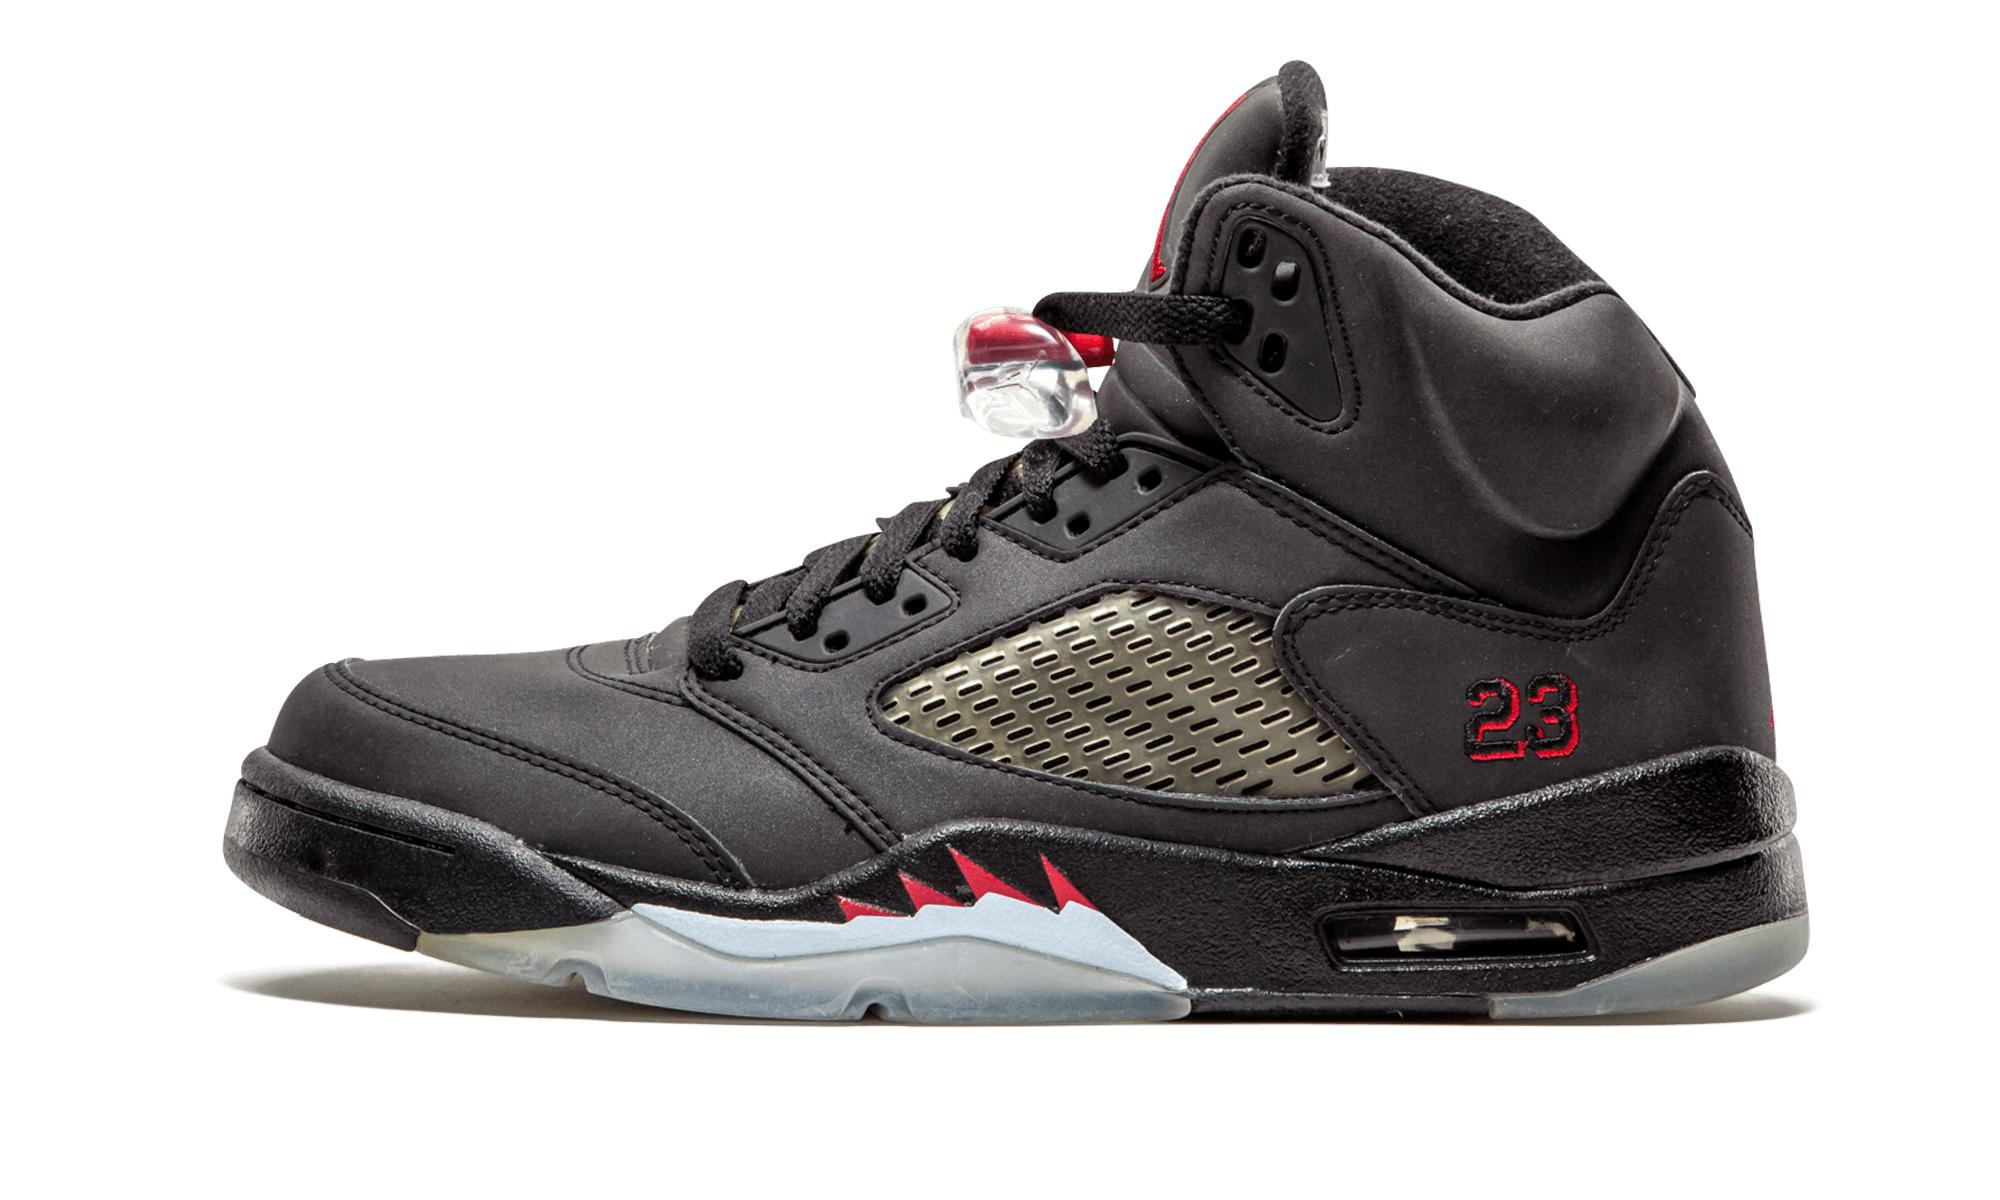 06fa3c7d78a5 Lyst - Nike Air 5 Retro Dmp in Black for Men - Save 15%